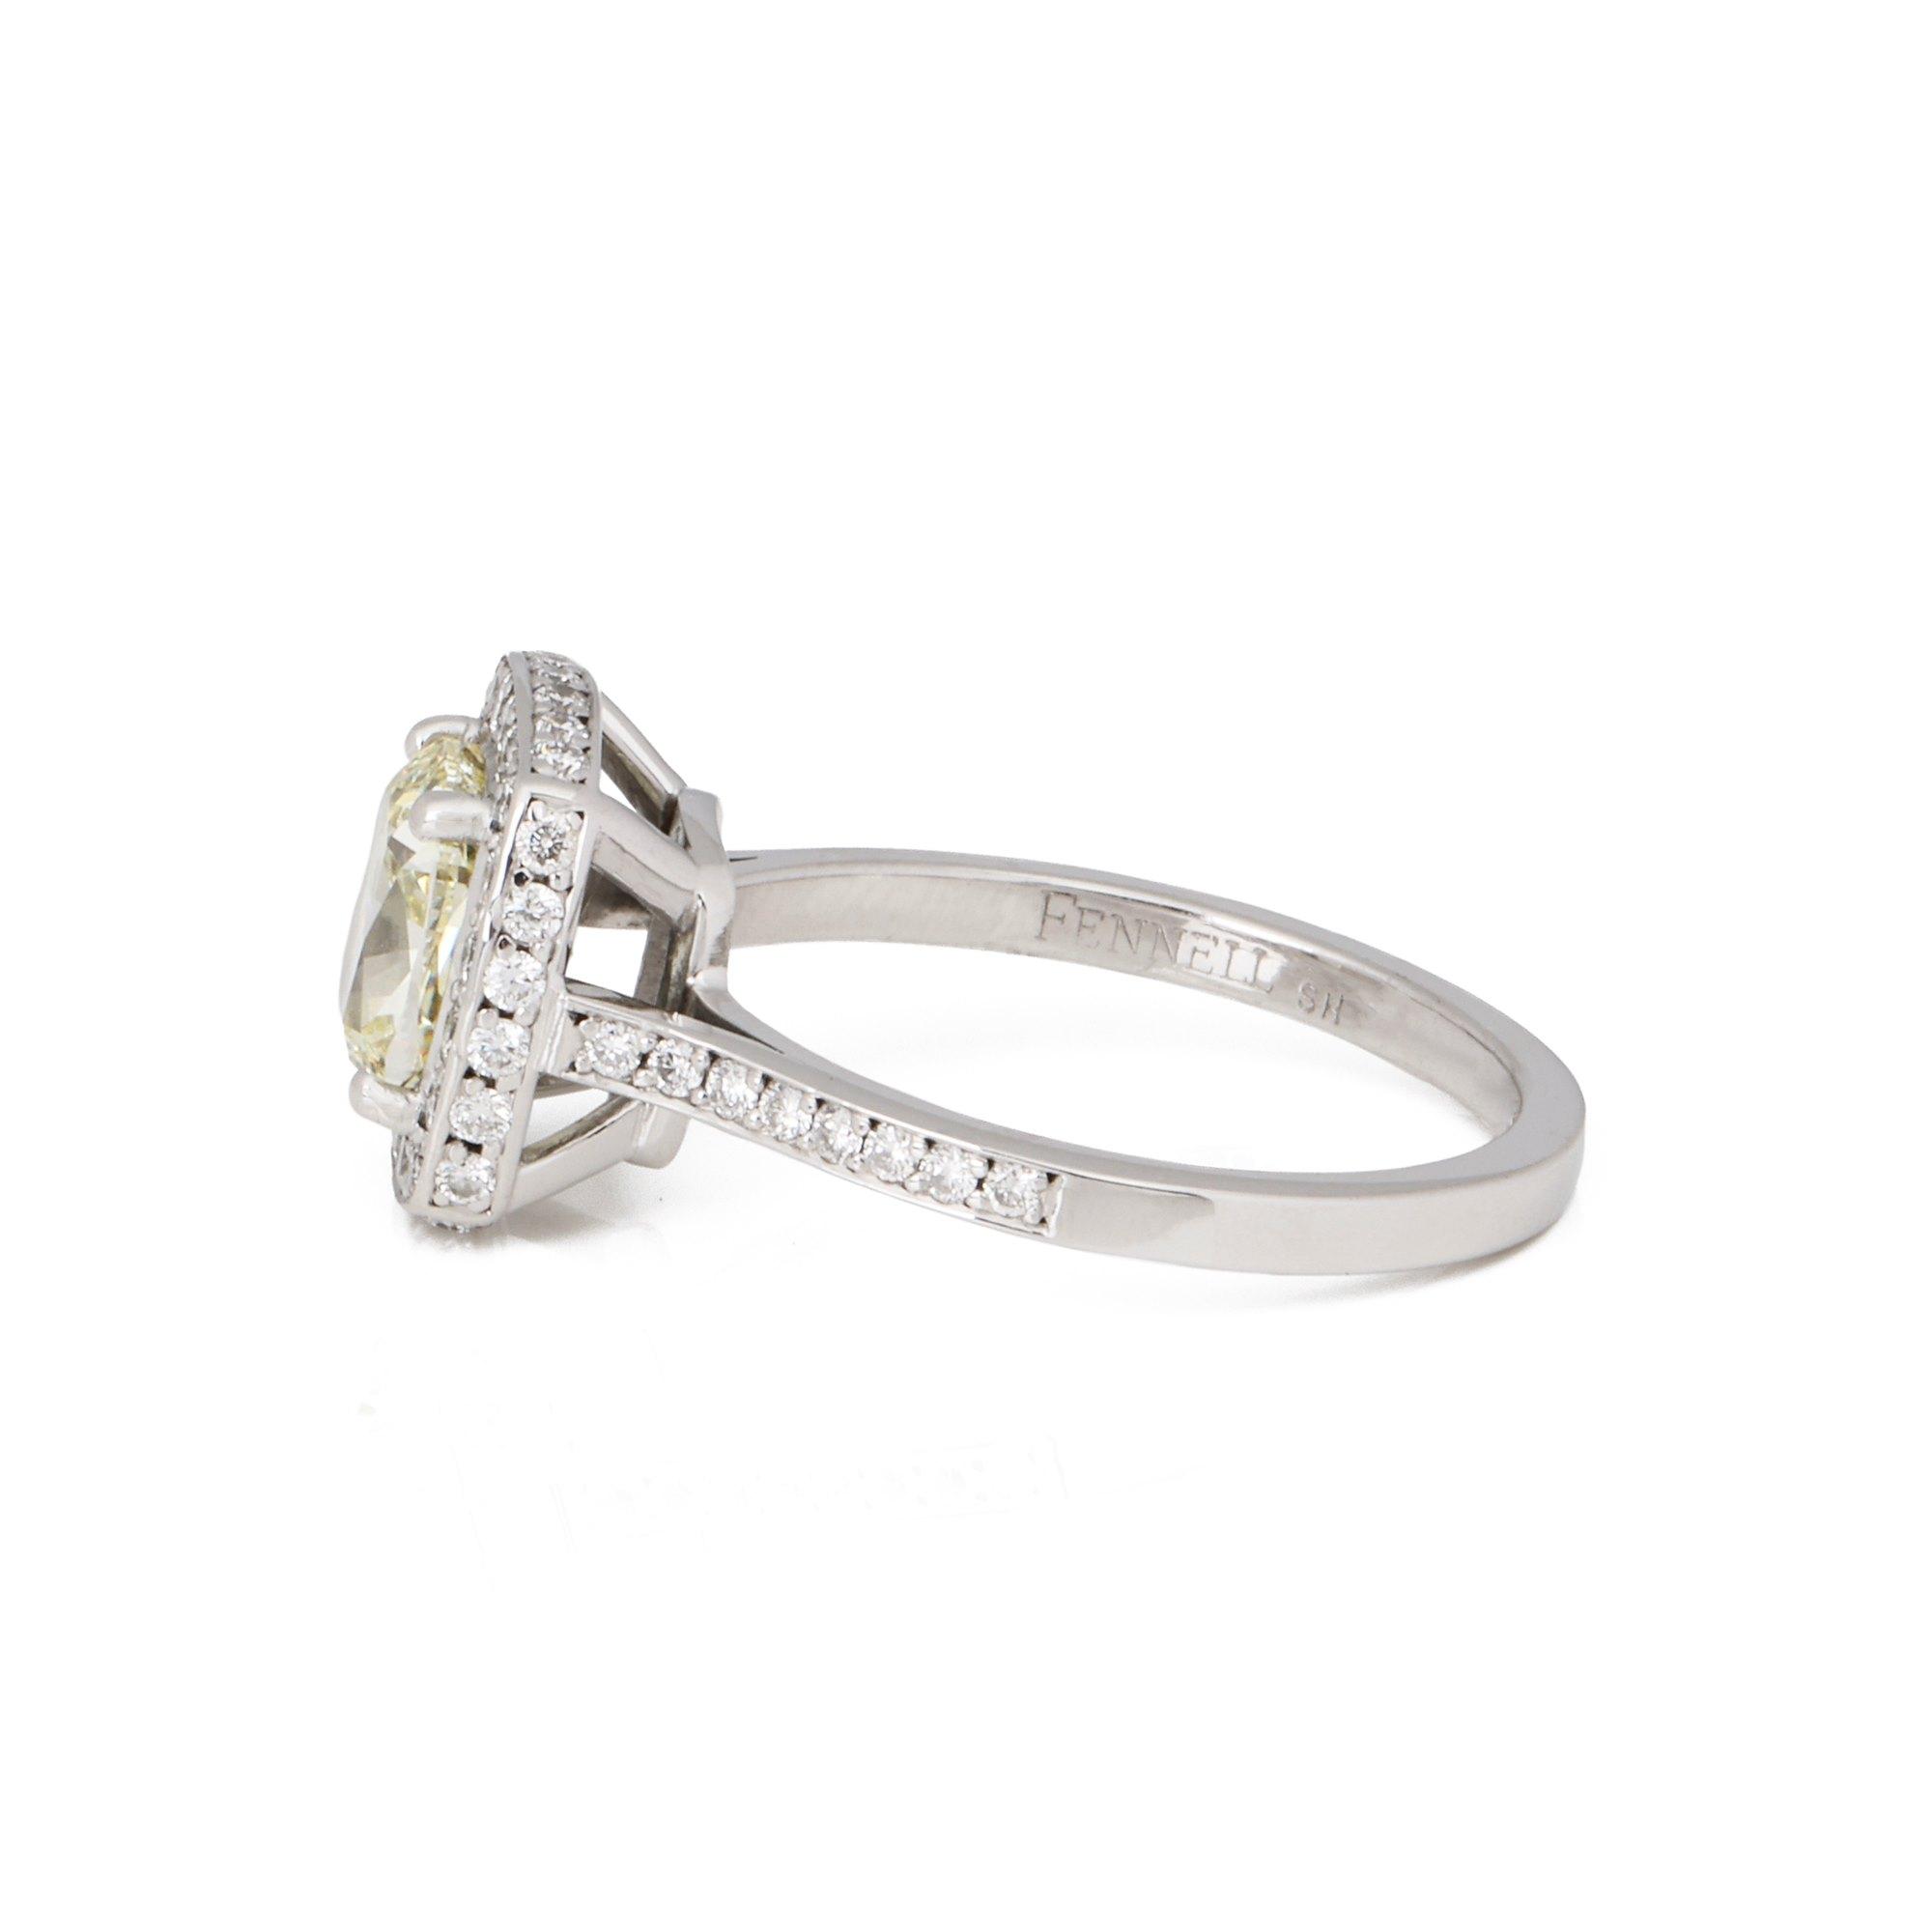 Theo Fennell Bespoke 1.57ct Yellow Diamond Cushion Cut Ring